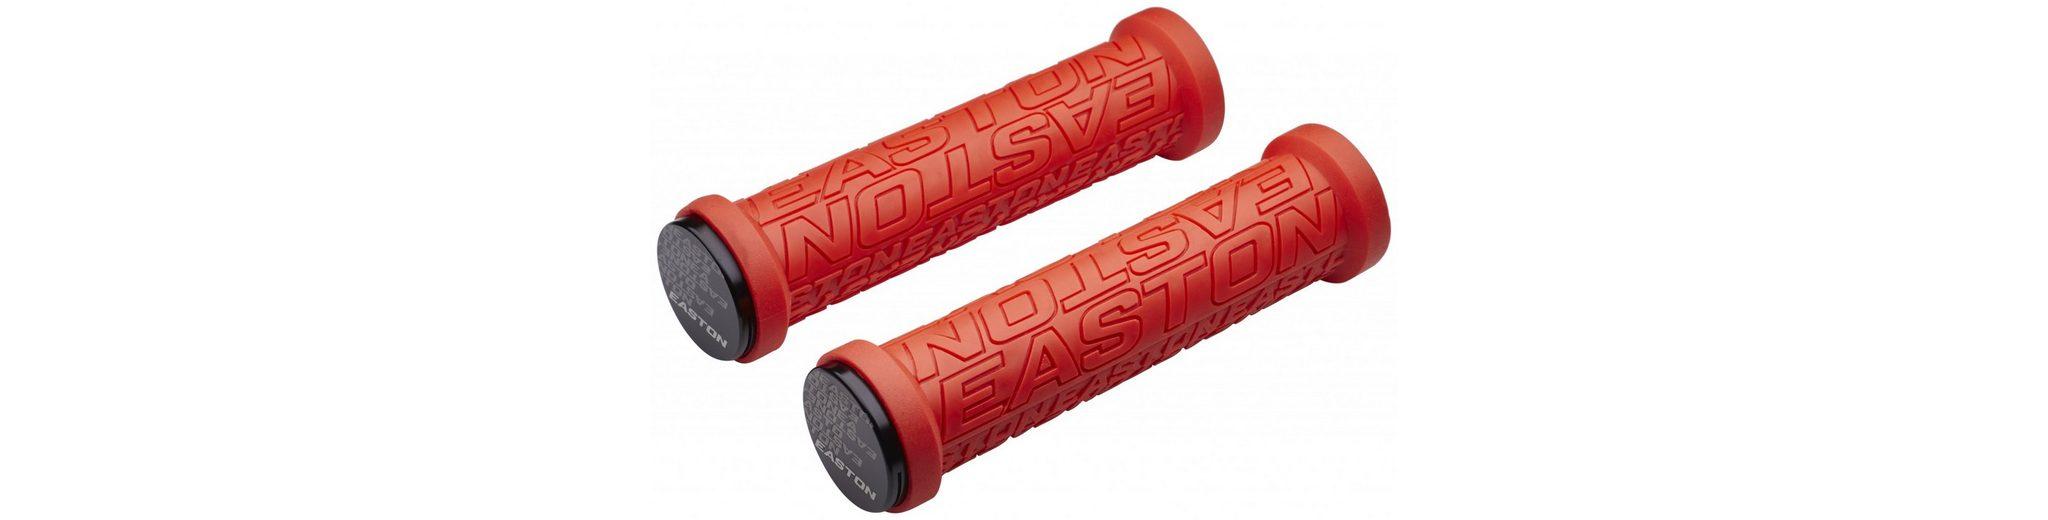 EASTON Fahrradgriff »Lock-On Griffe 30mm«